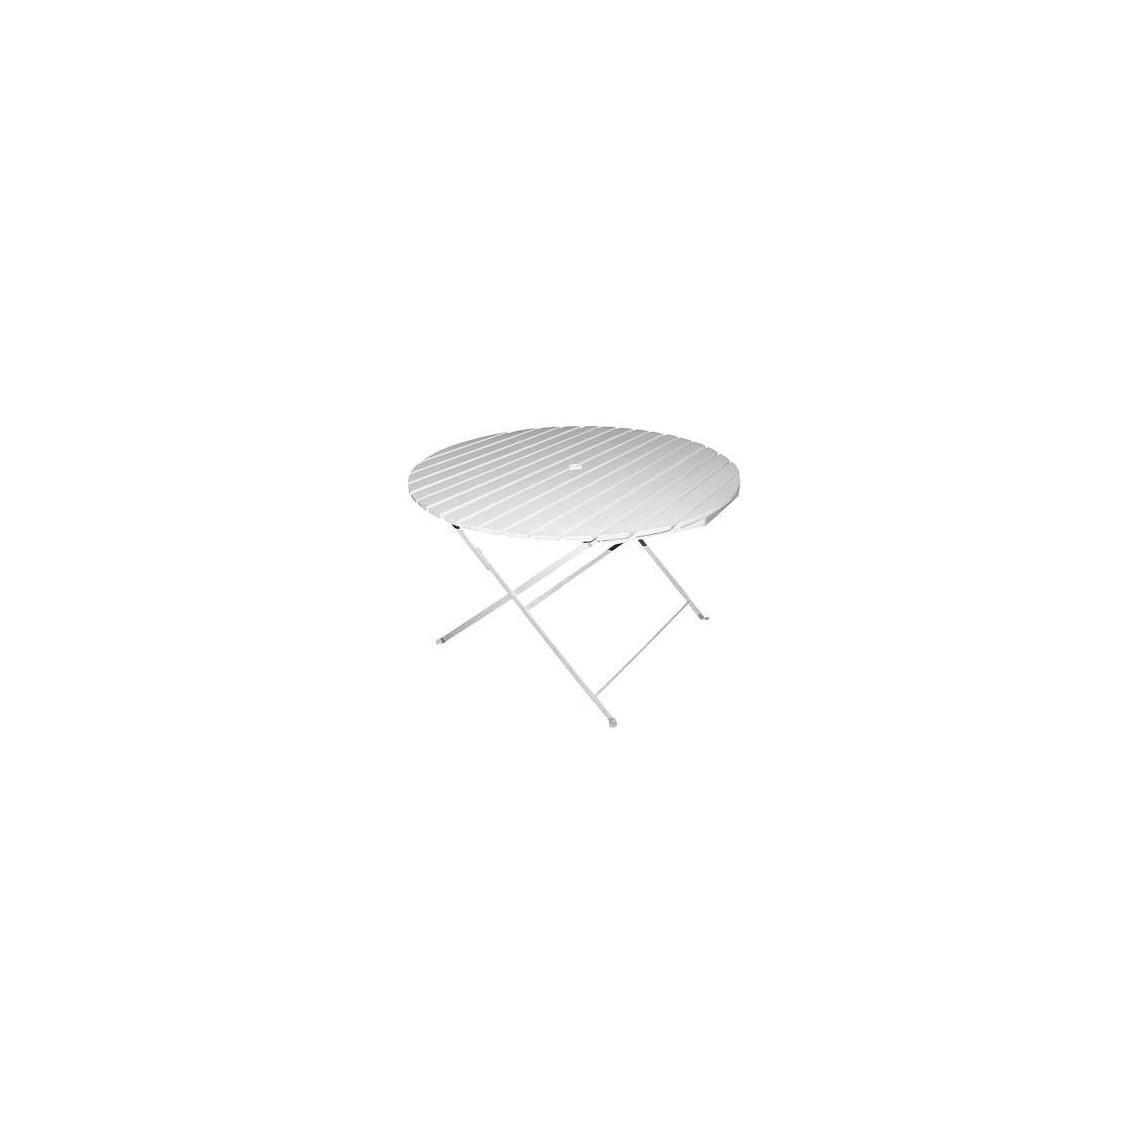 Table de jardin bois Capri (Ø 1